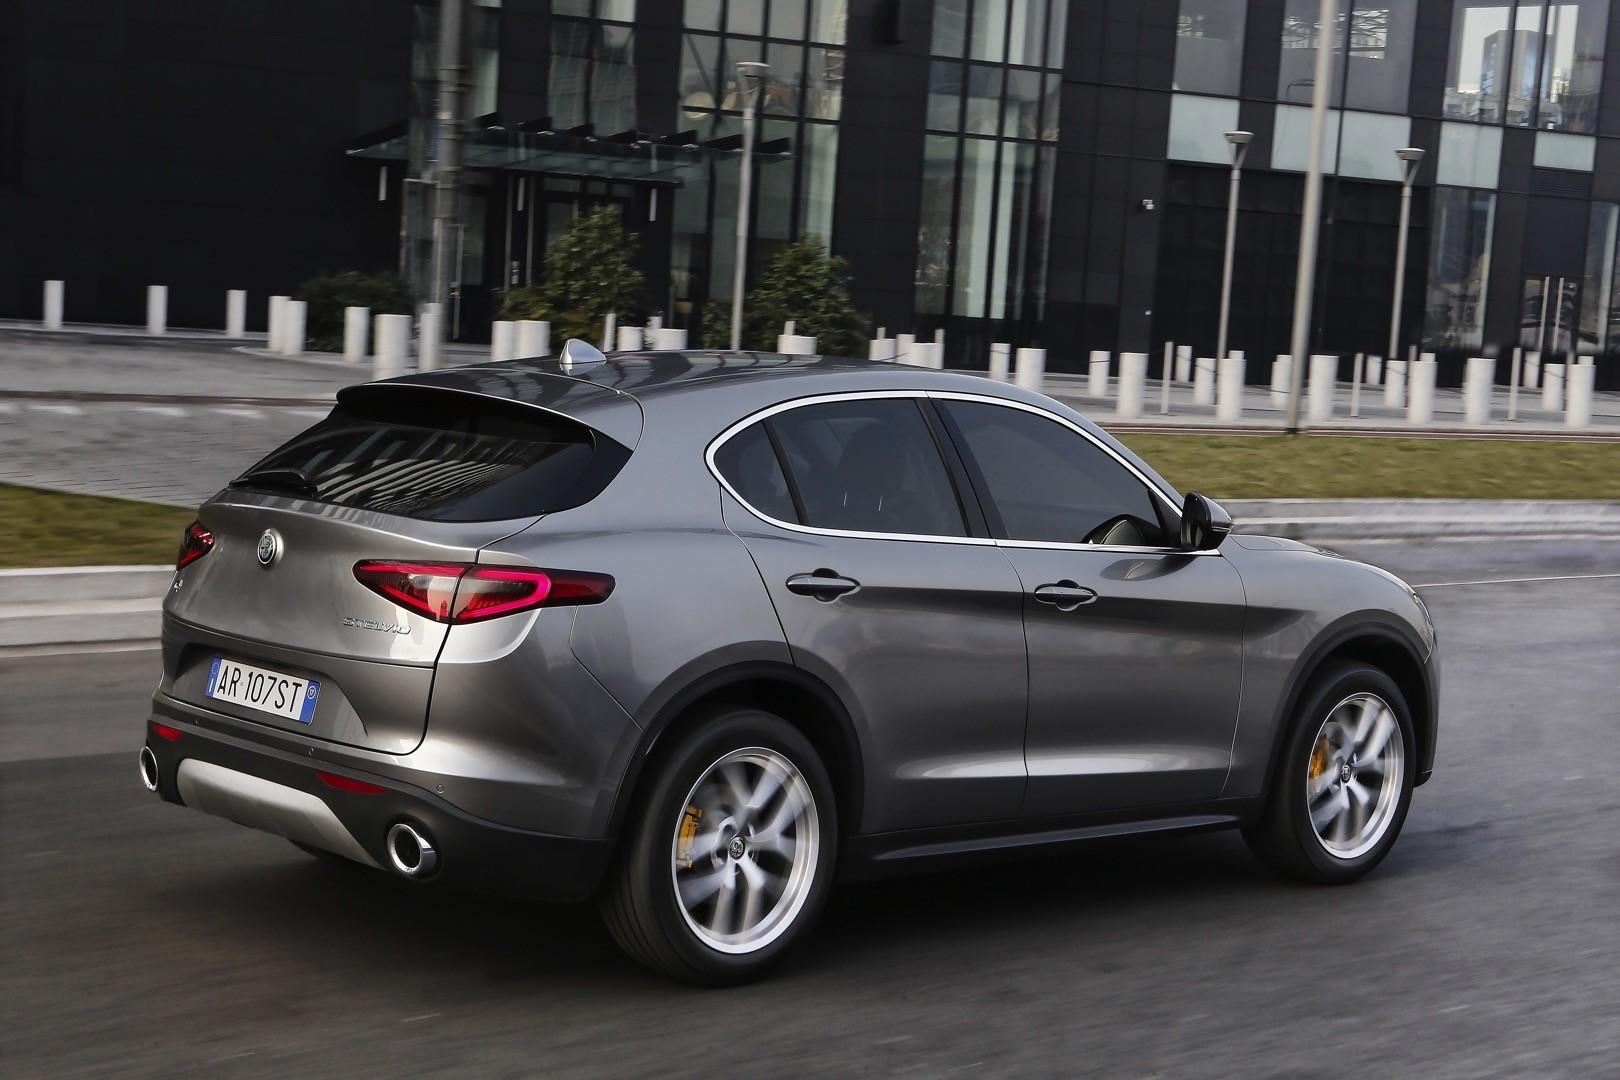 2019 Maserati Levante >> New Maserati SUV Coming By 2020 With Alfa Romeo Underpinnings - autoevolution